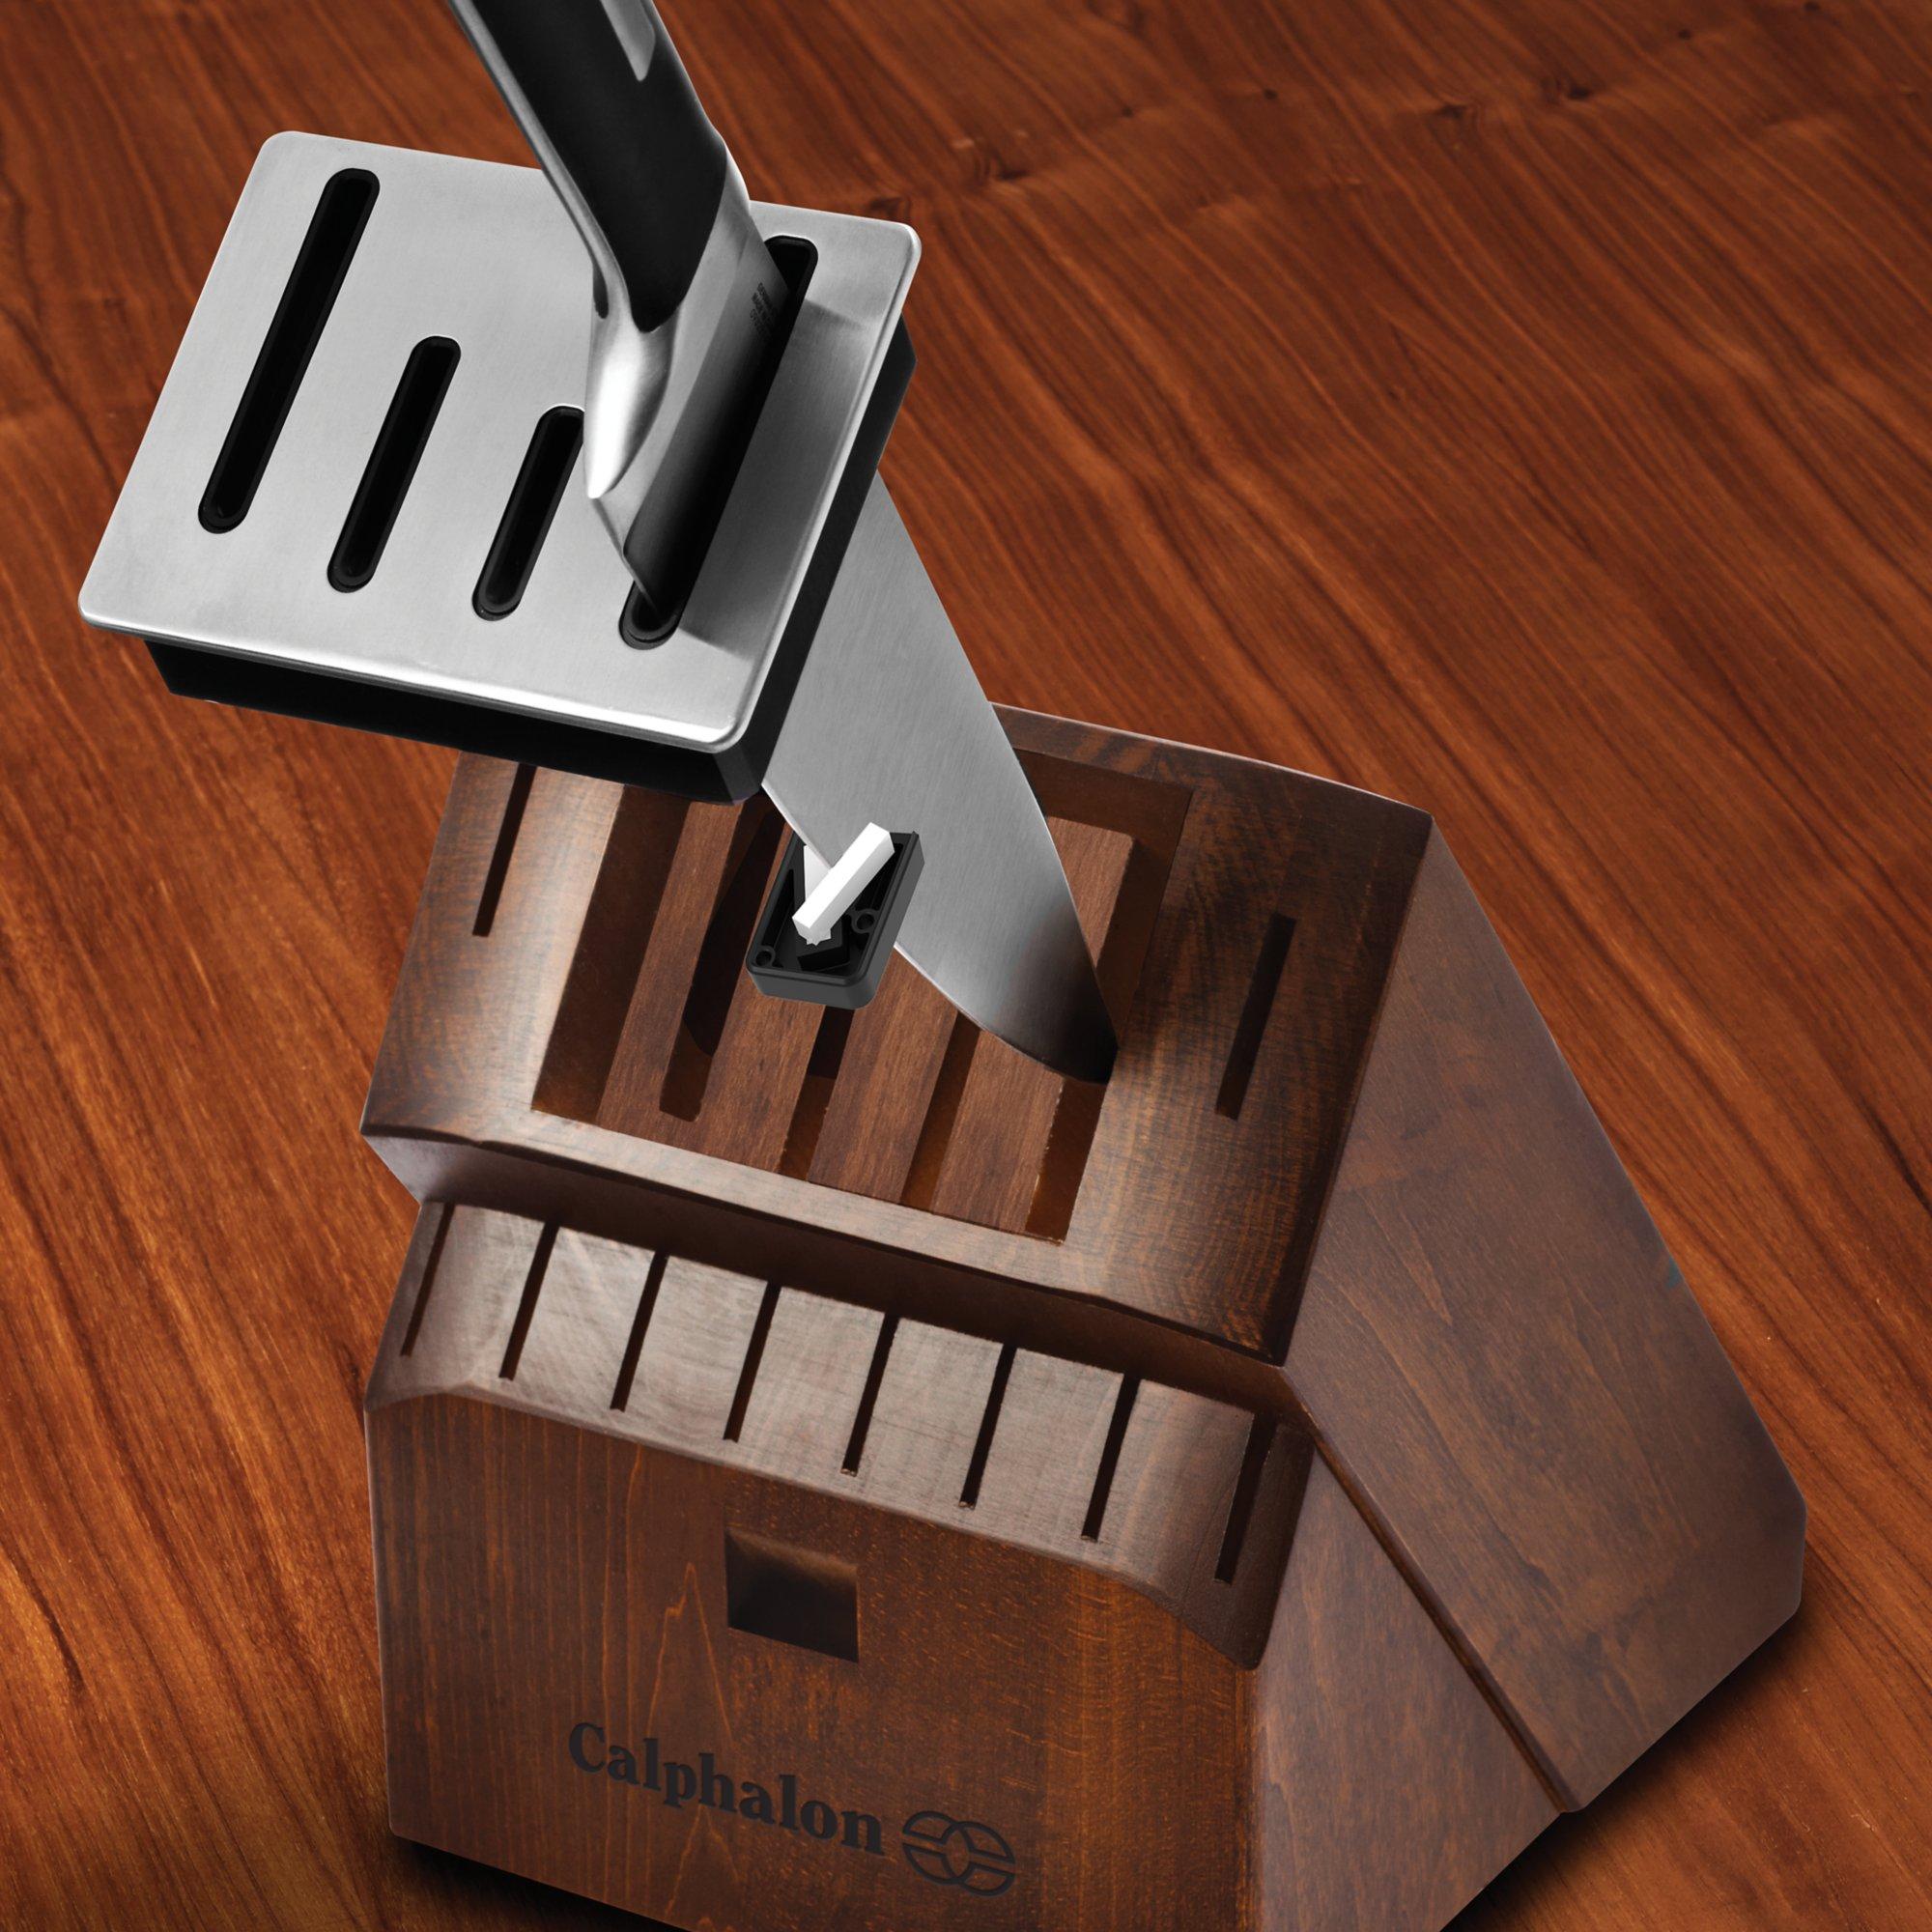 calphalon precision self sharpening 15 pc cutlery set